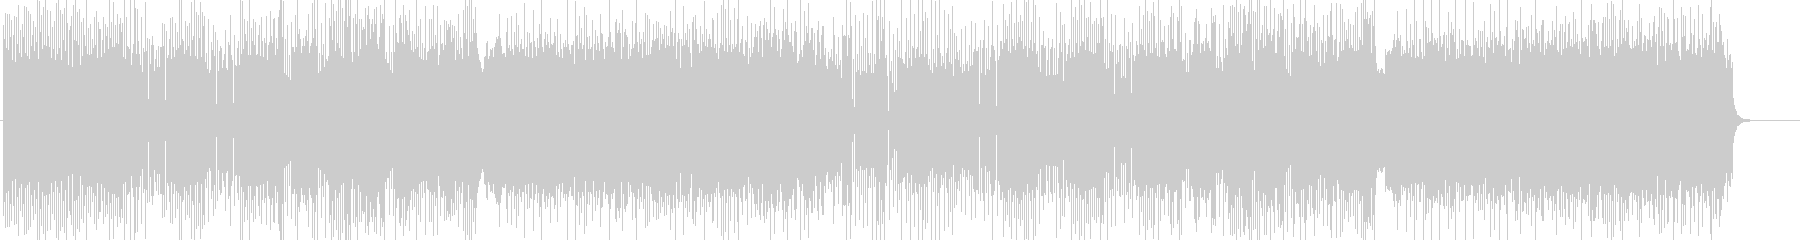 「HR/HM」「DEATH」BGM179の未再生の波形